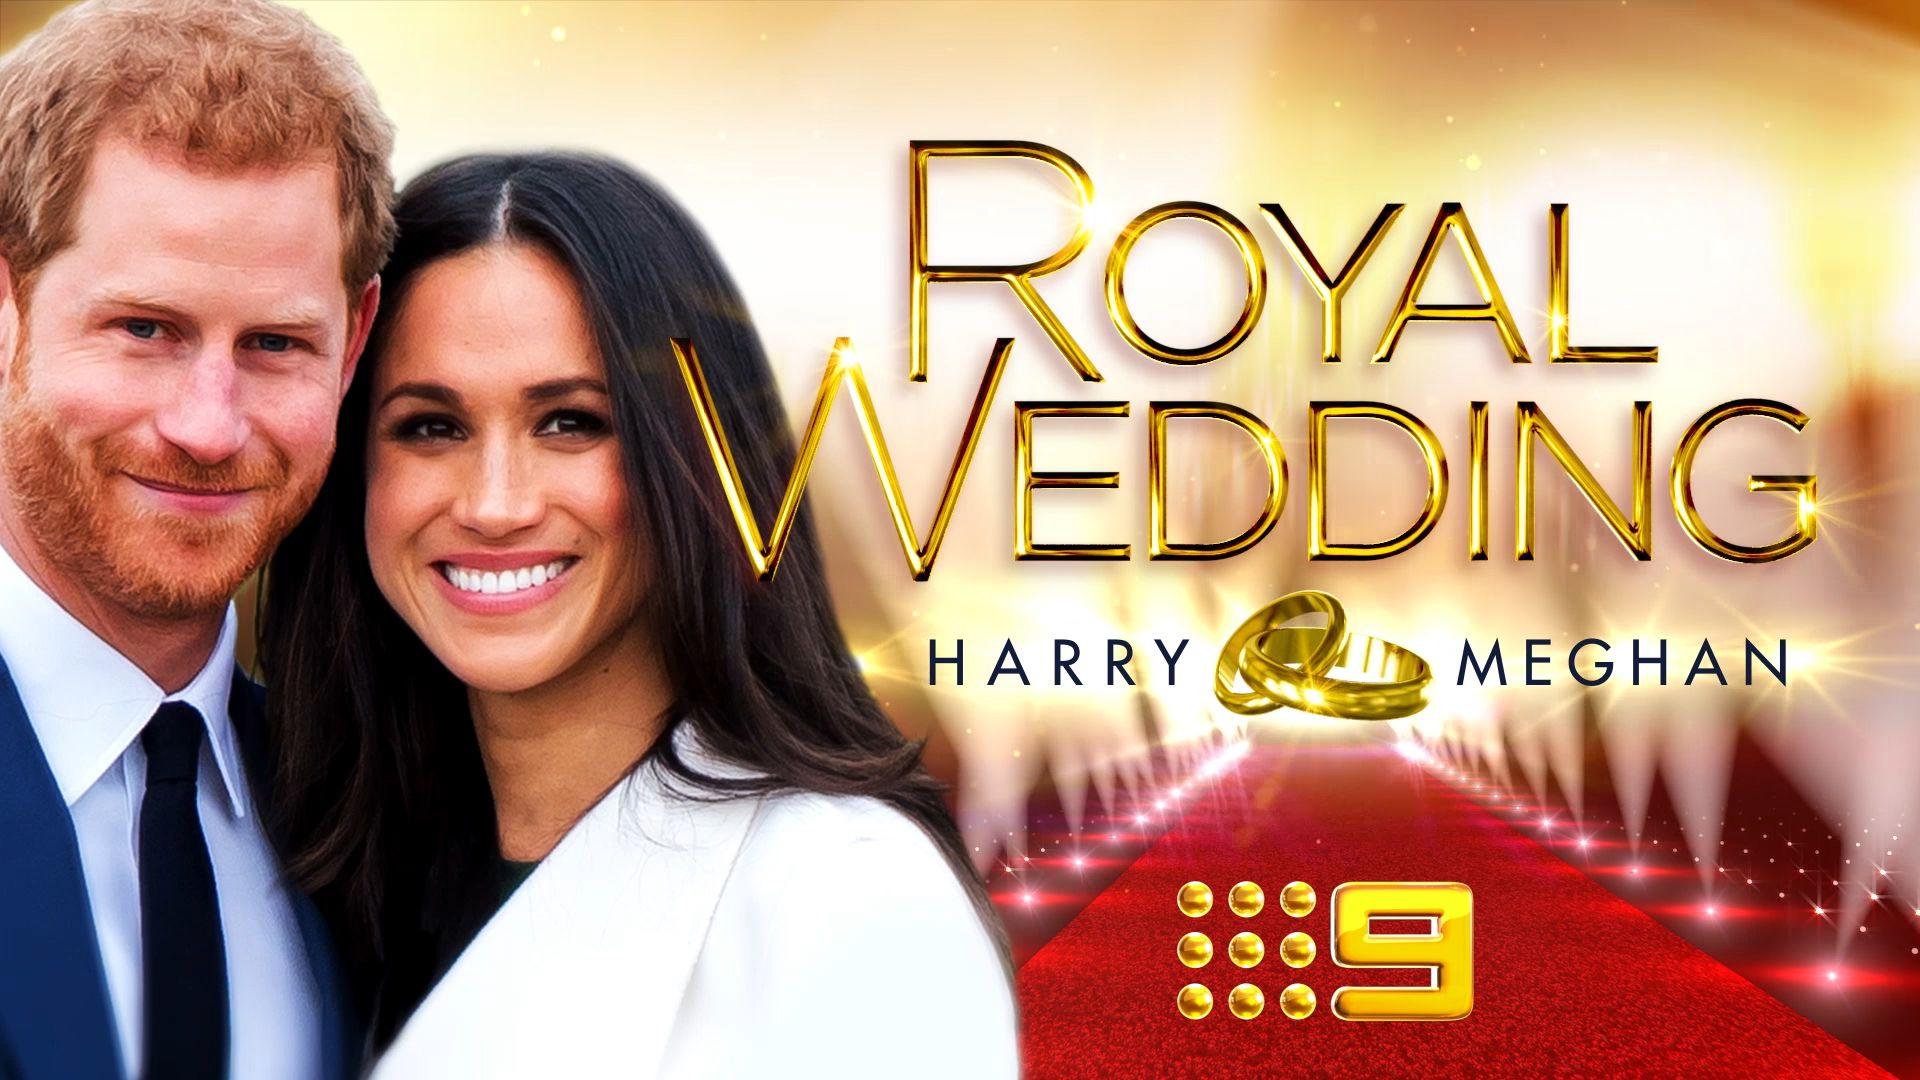 Royal wedding - Harry & Meghan on Nine Entertainment